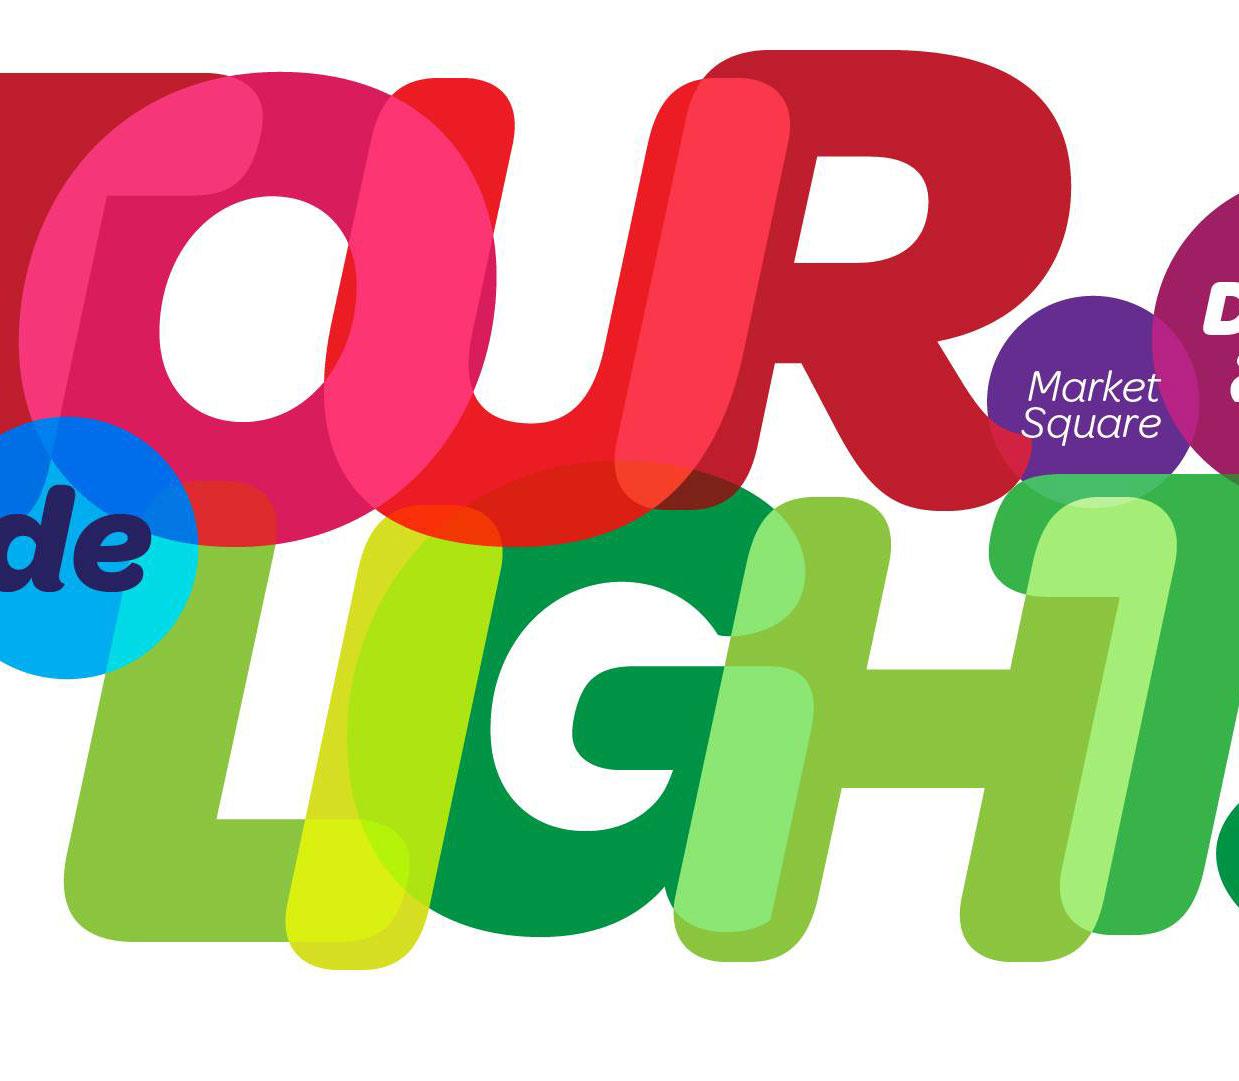 Tour de Lights <br> December 15 <br>6 PM - 8:30 PM<br> Market Square<br>